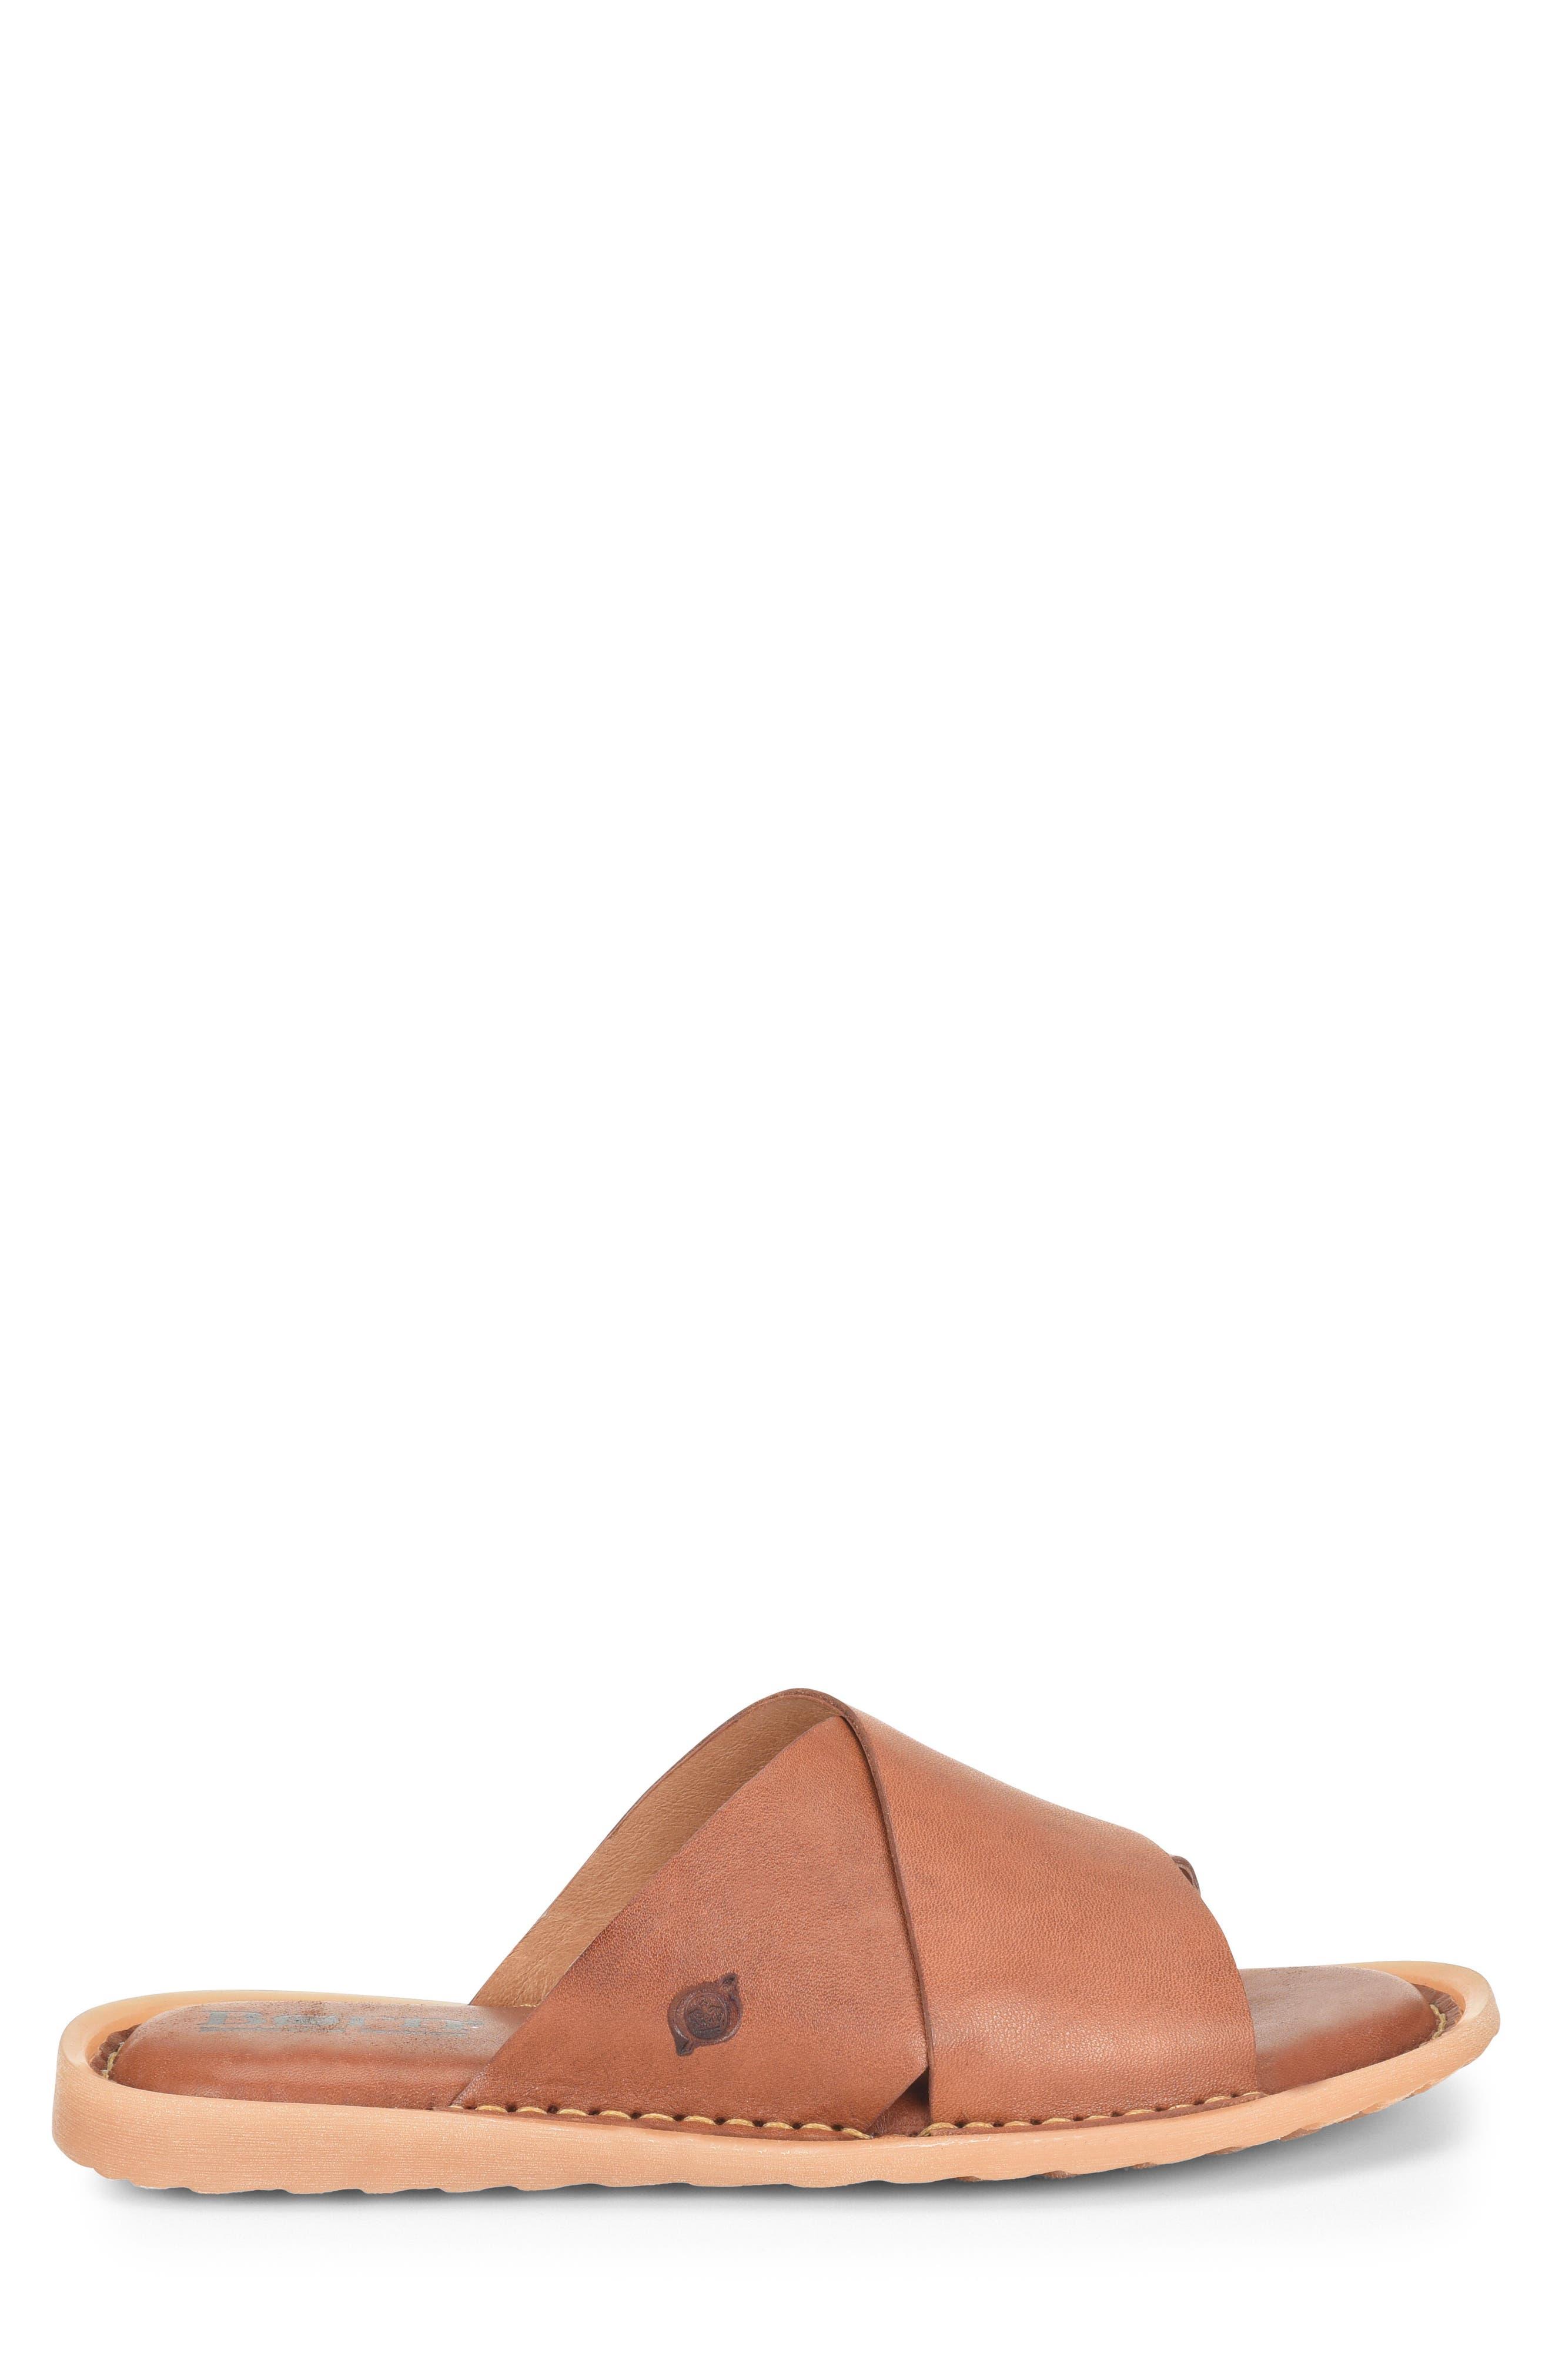 Getaway Slide Sandal,                             Alternate thumbnail 3, color,                             Rust Leather